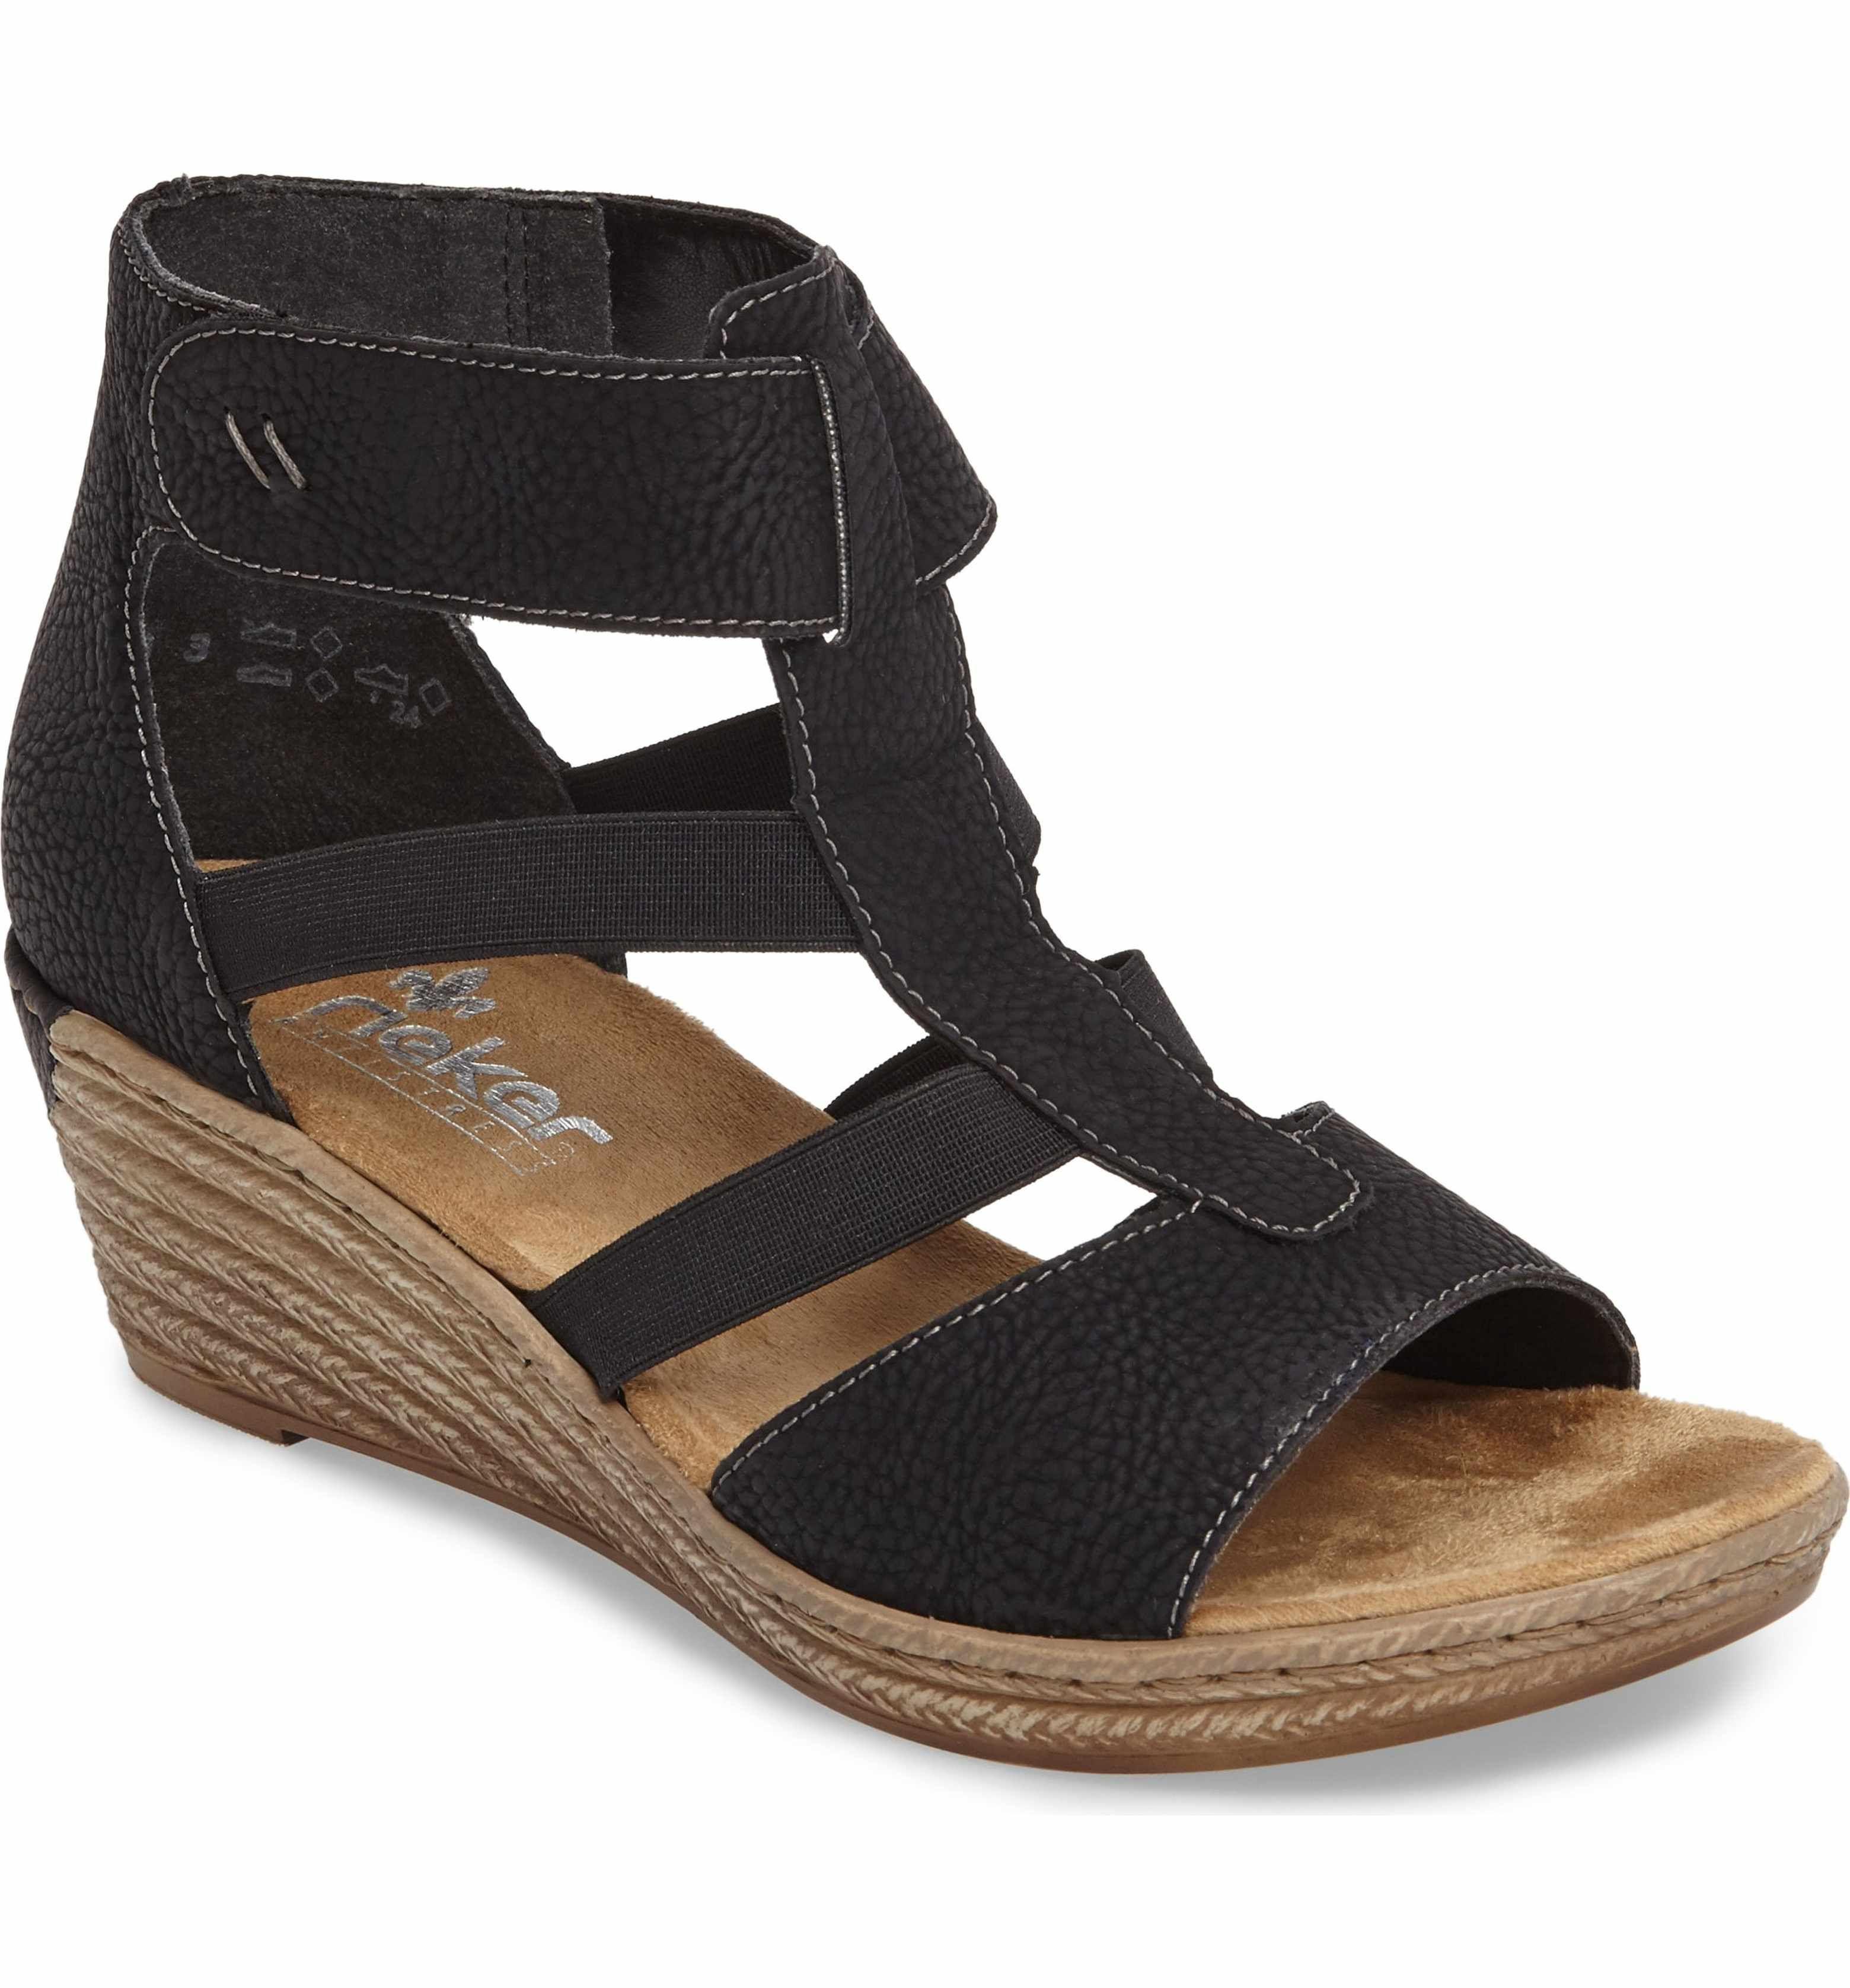 88cf45557ae Main Image - Rieker Antistress Fanni 39 Wedge Sandal (Women)   Shoes ...